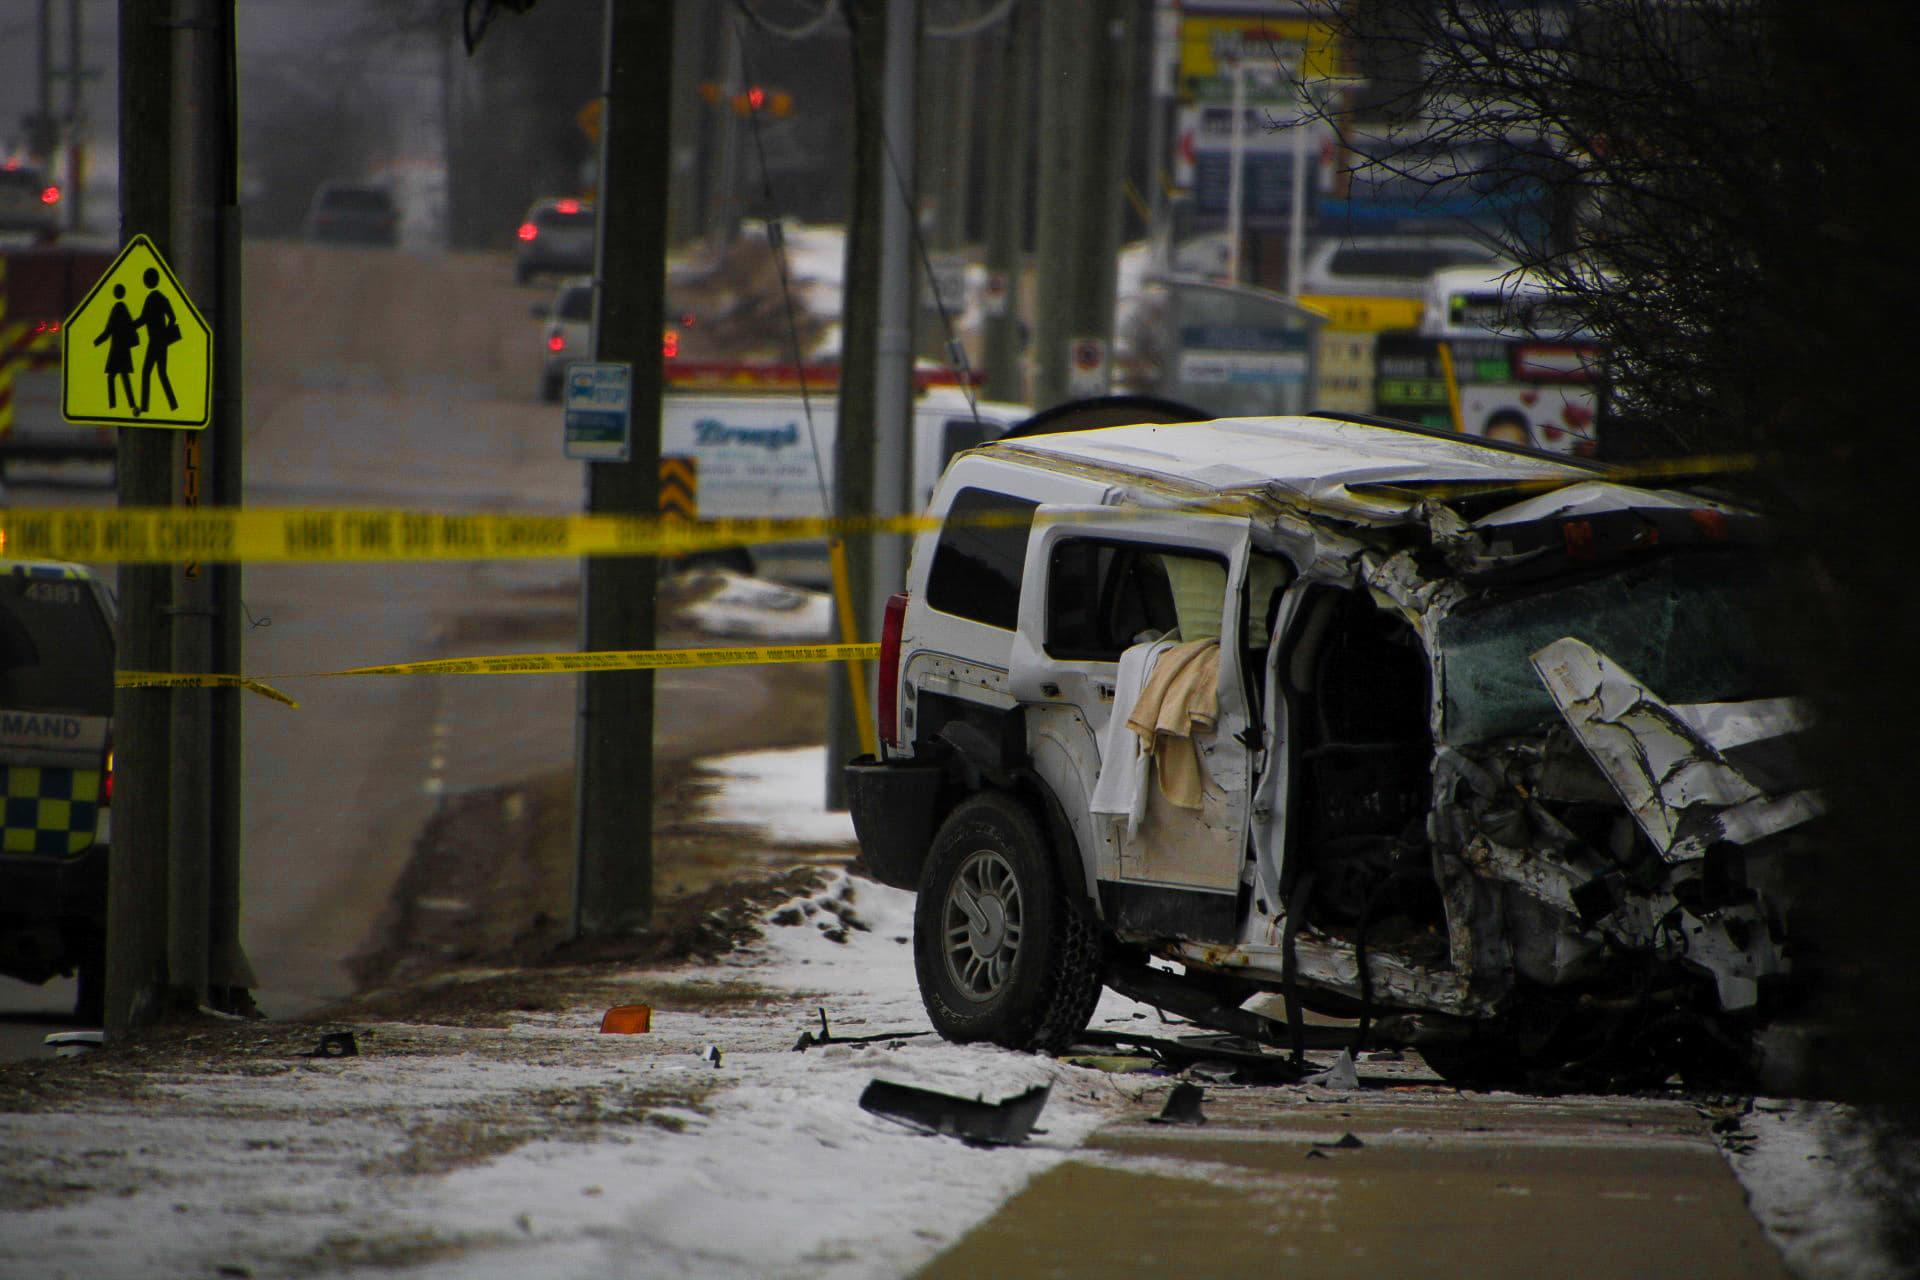 Serious single-vehicle collision closes Bath Road